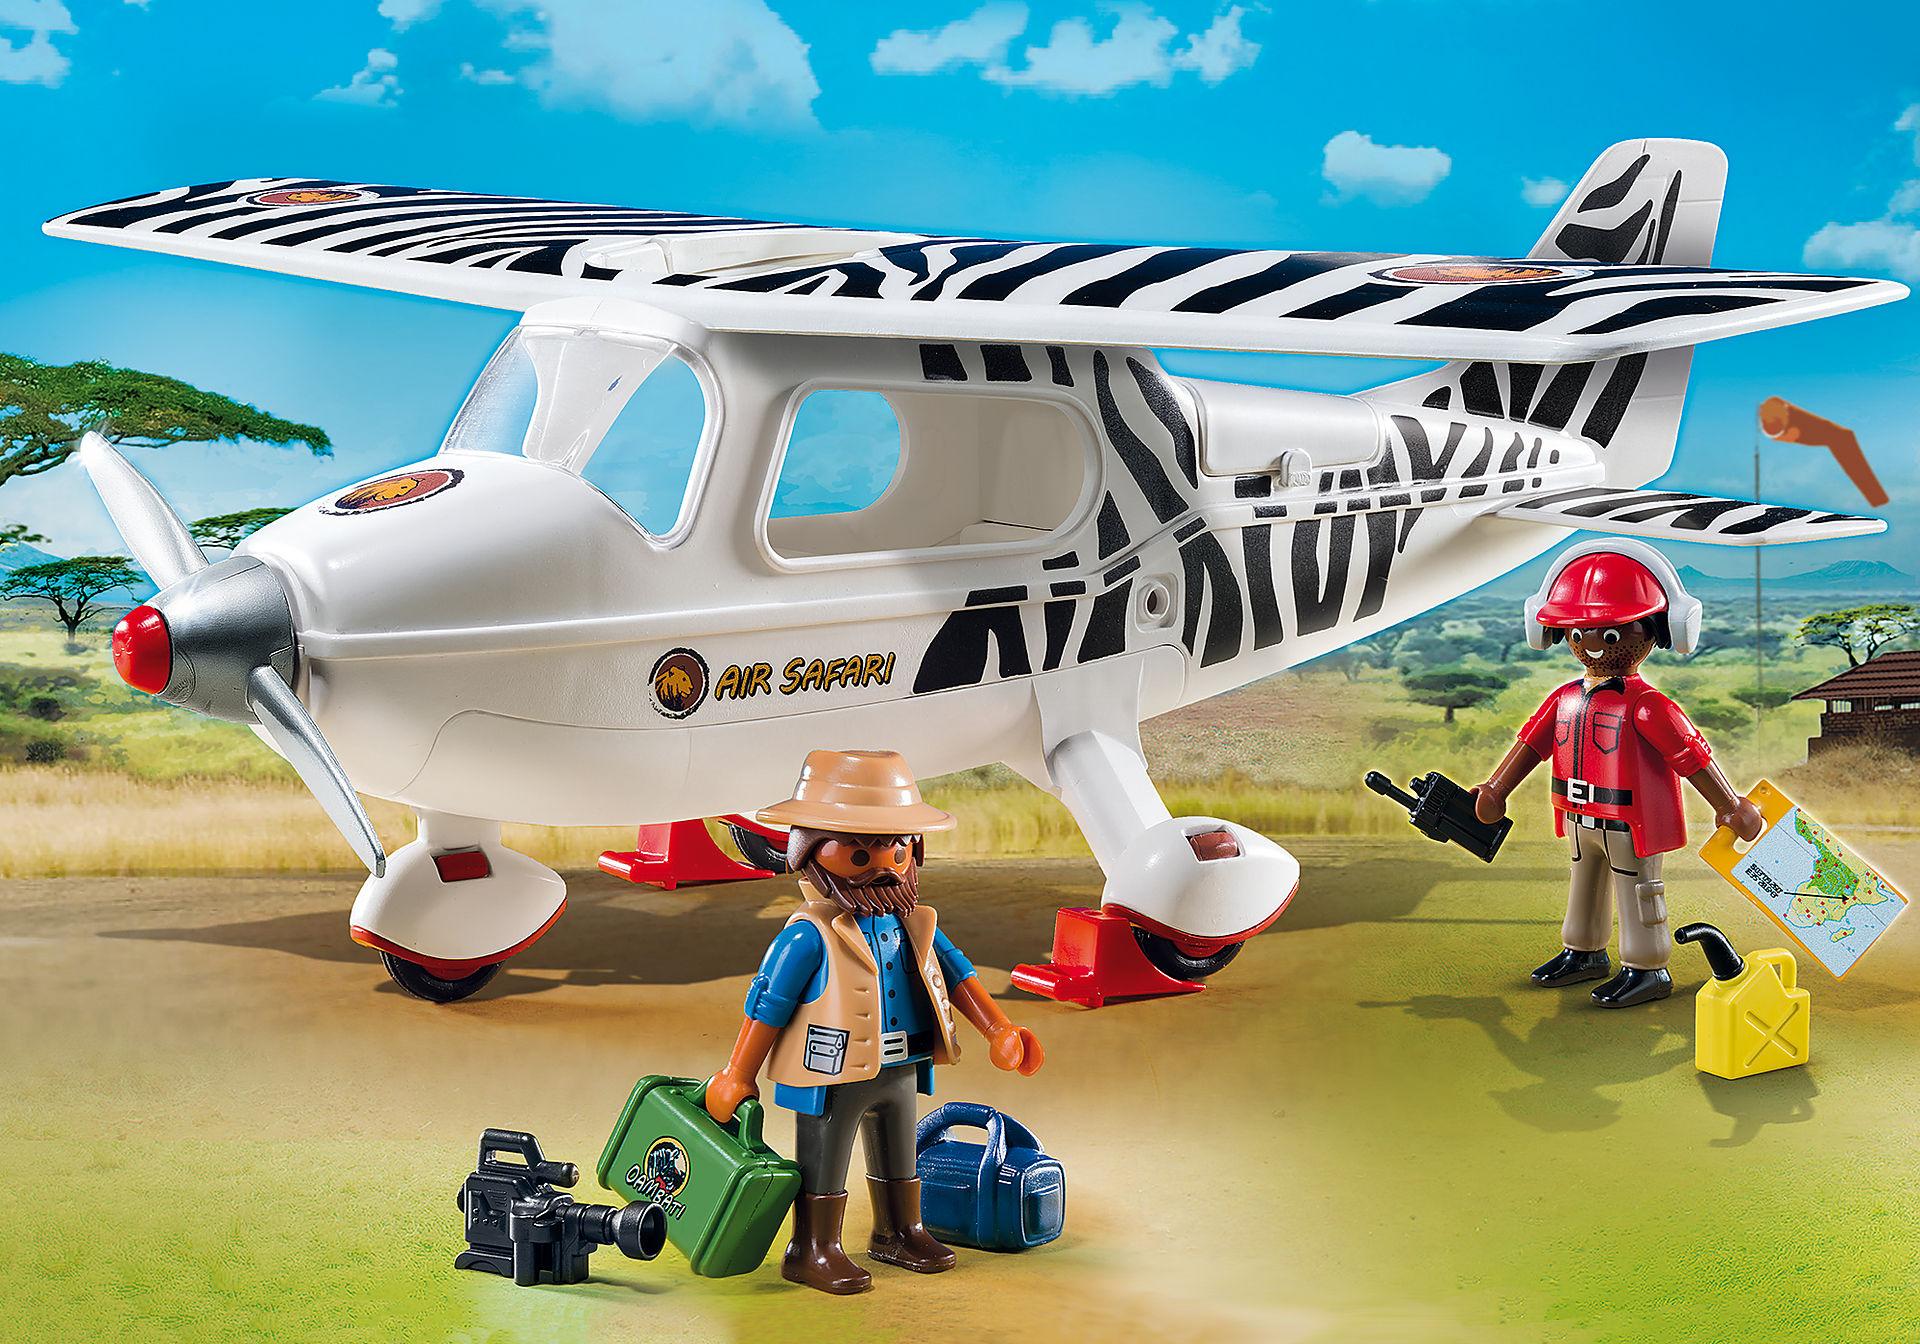 http://media.playmobil.com/i/playmobil/6938_product_detail/Avioneta de safari